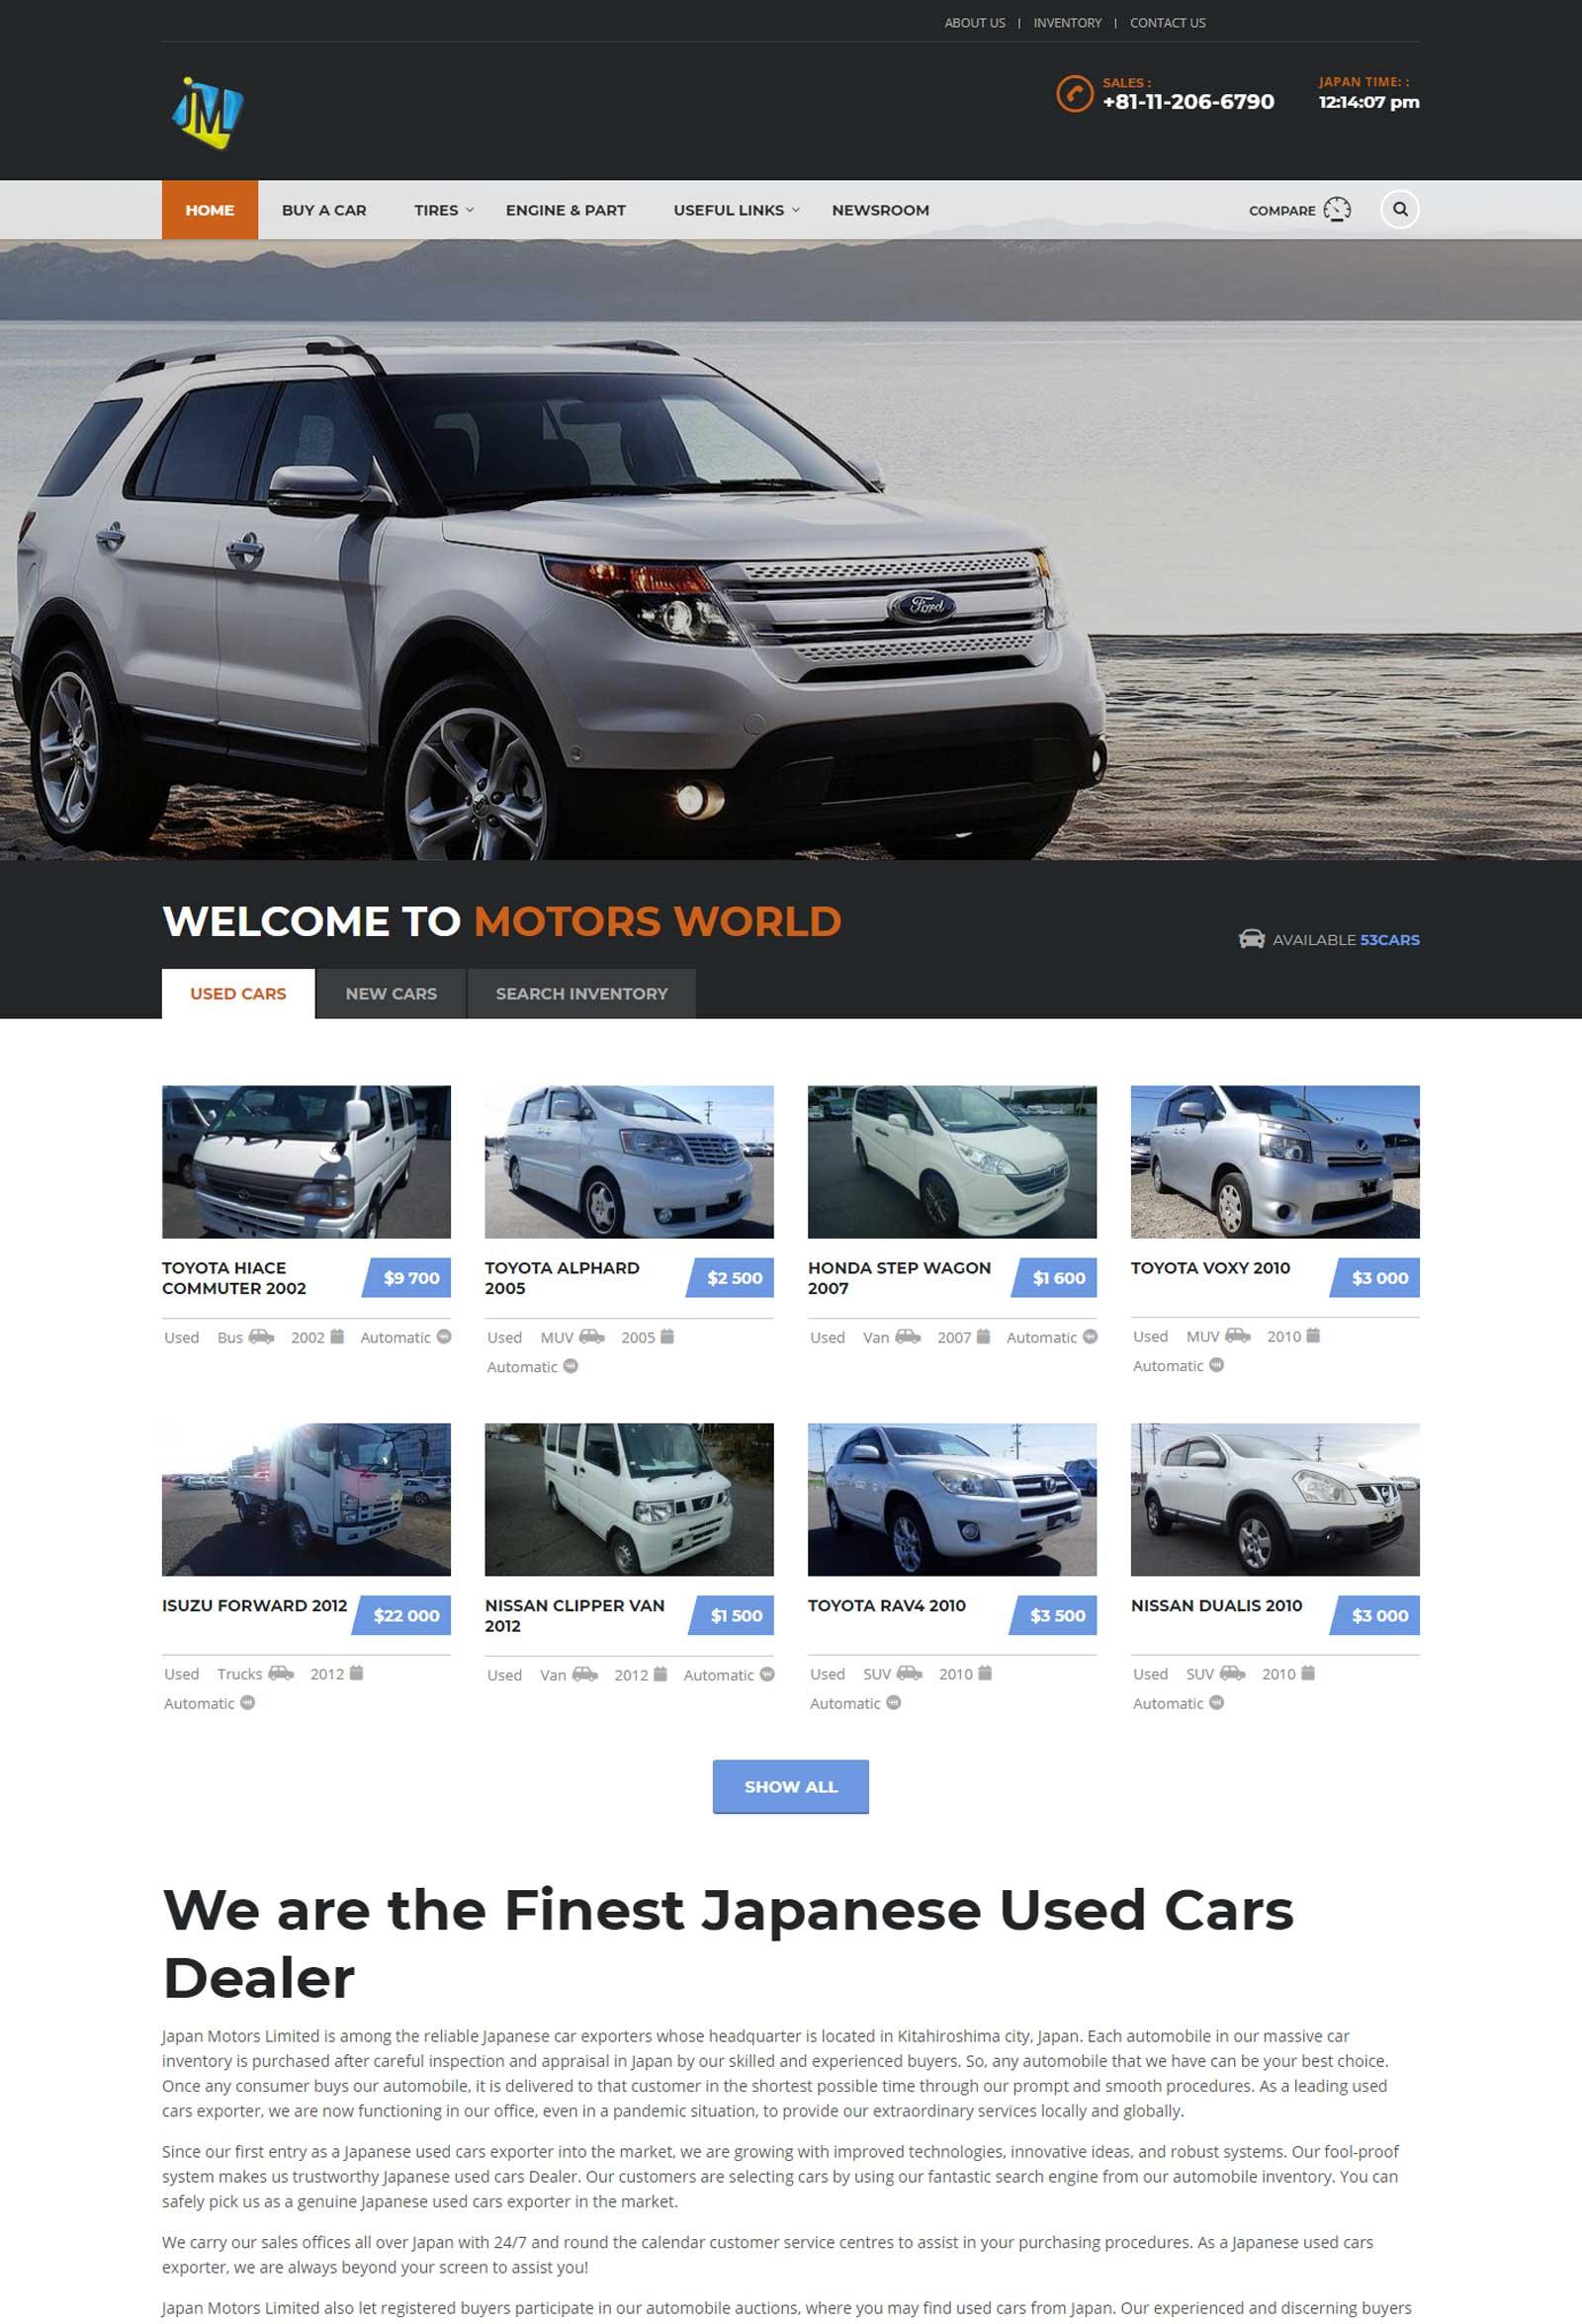 japan-motors-website